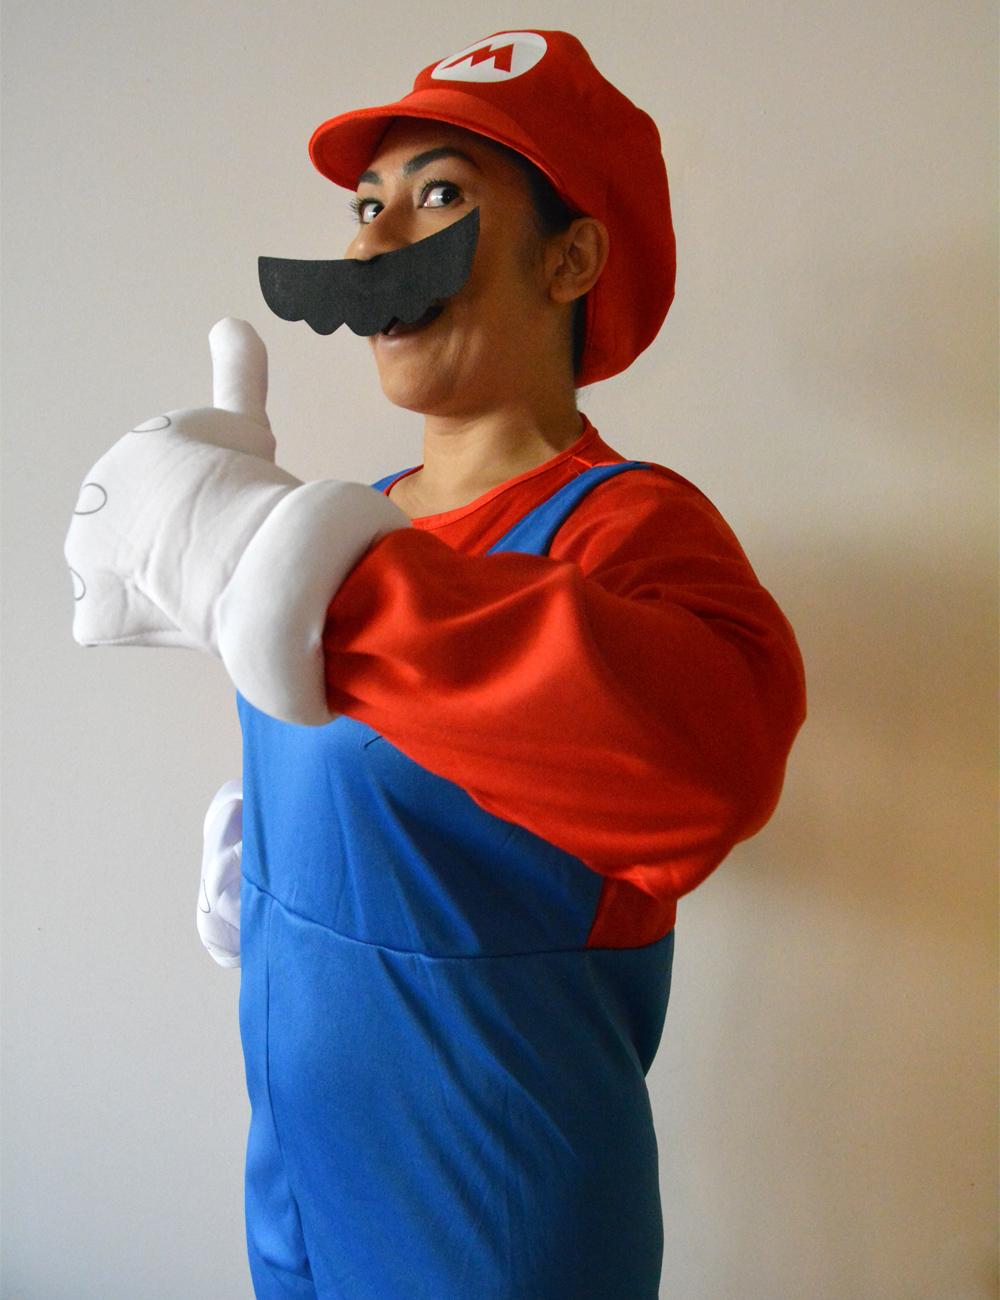 Mario Halloween costume idea for MarioKart fans